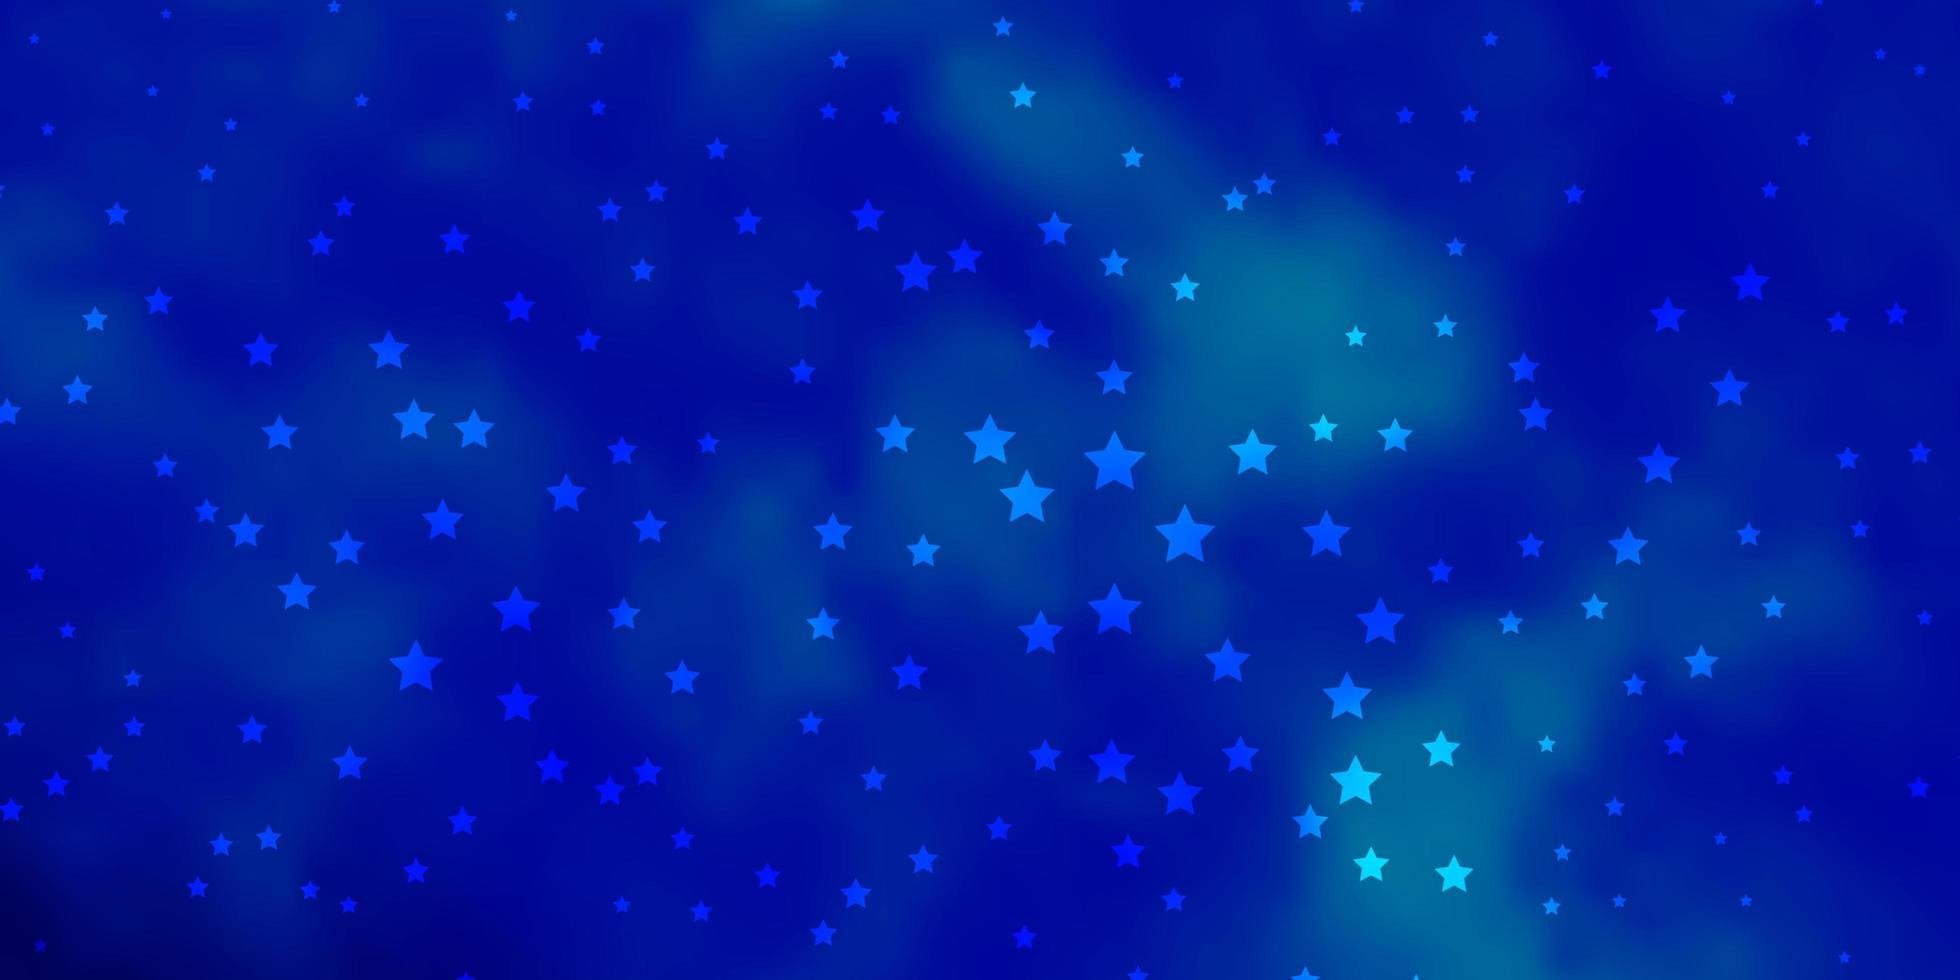 dunkelblaue Vektorschablone mit Neonsternen. vektor